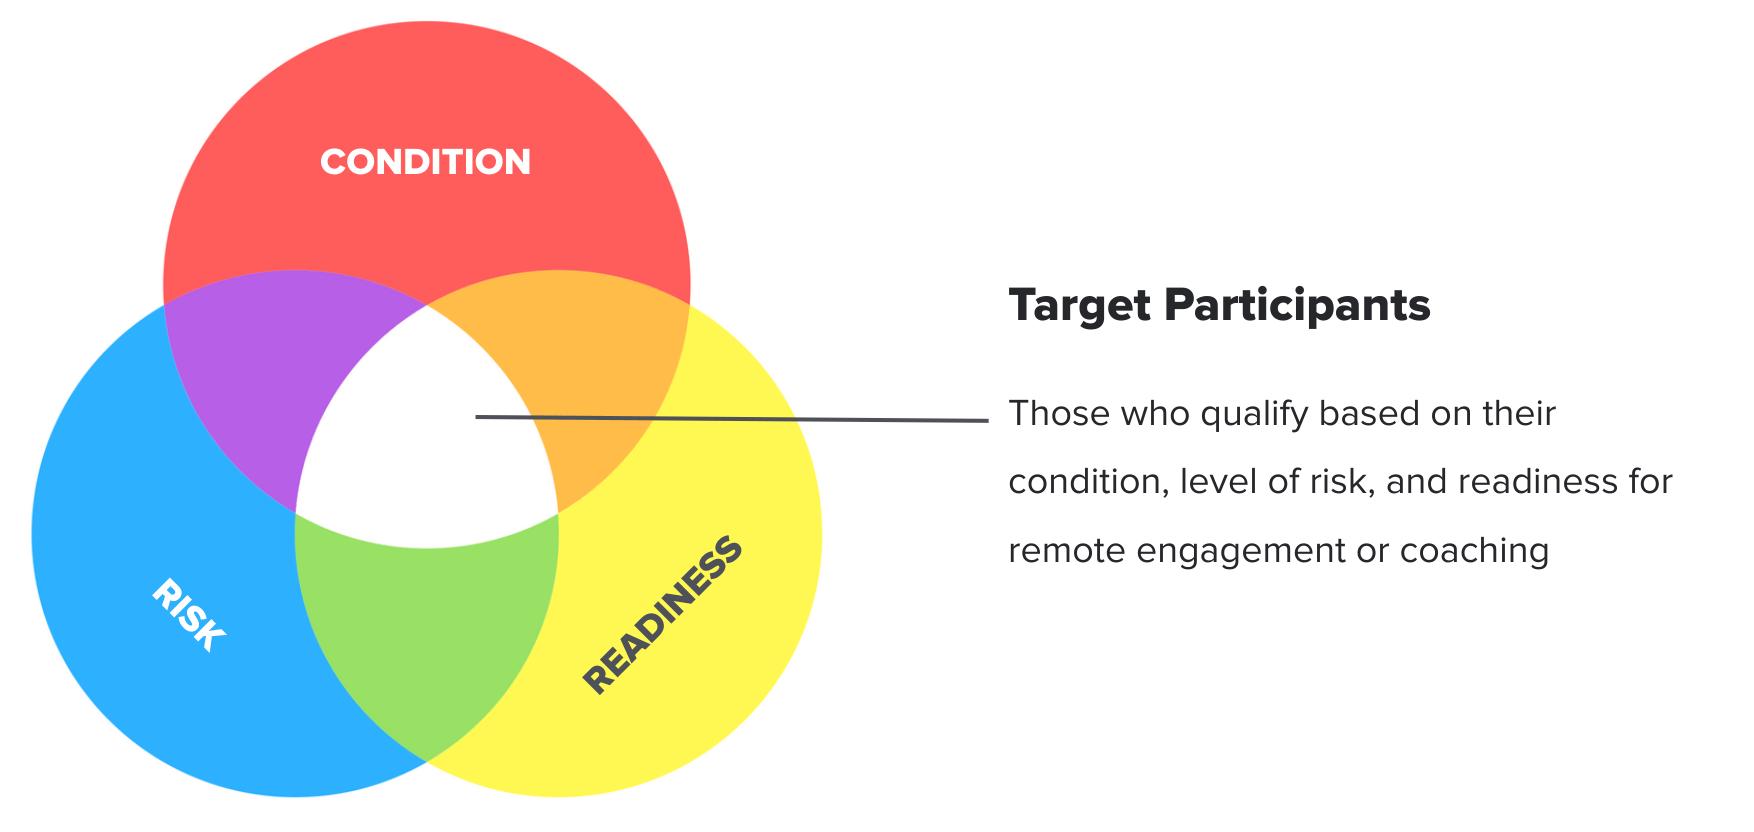 target-participants-diagram-compressed.png